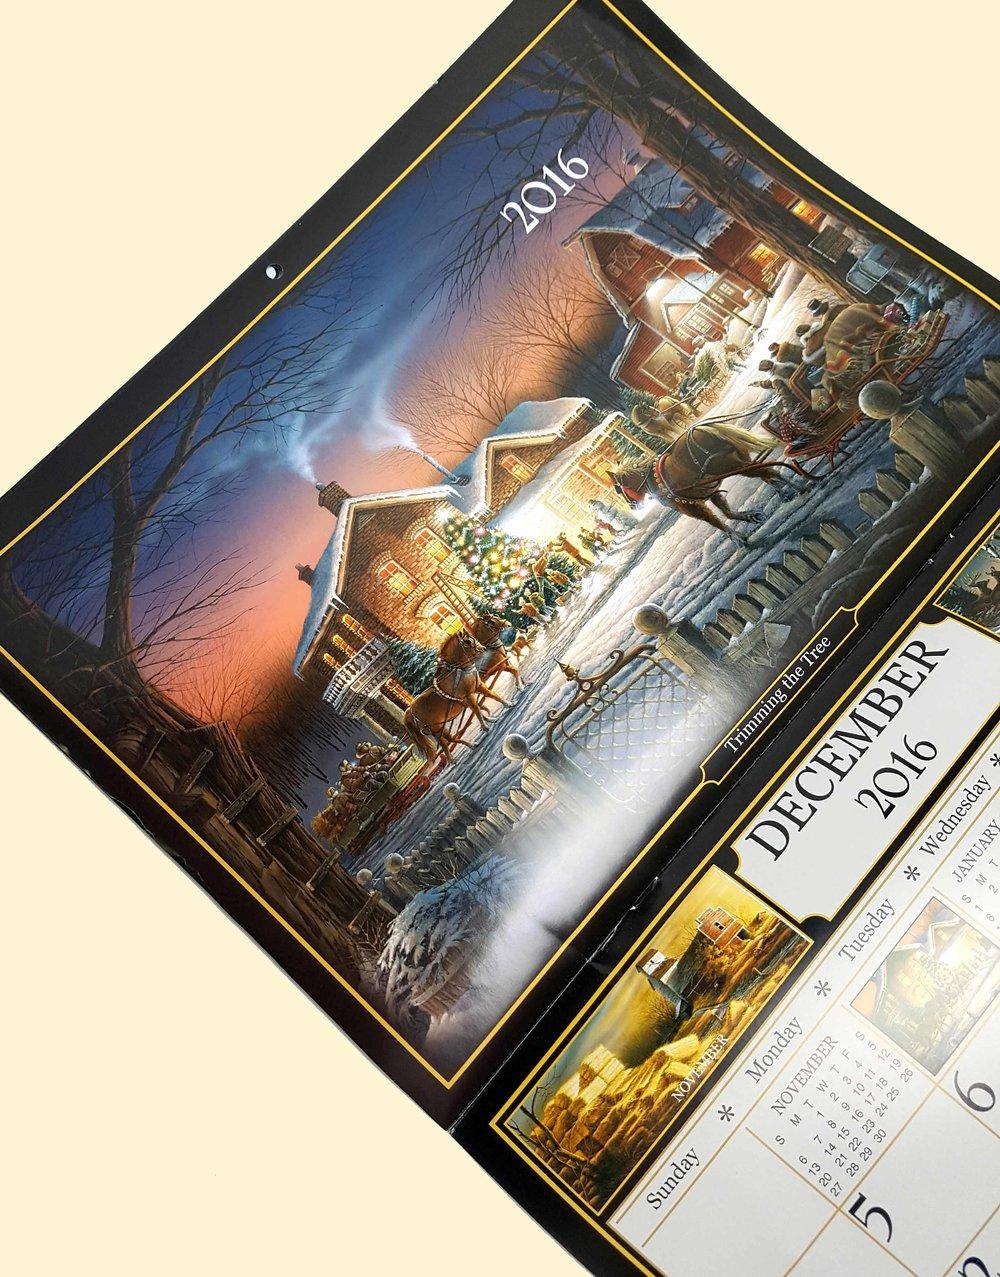 wall-calendar-printing-in-china-korea